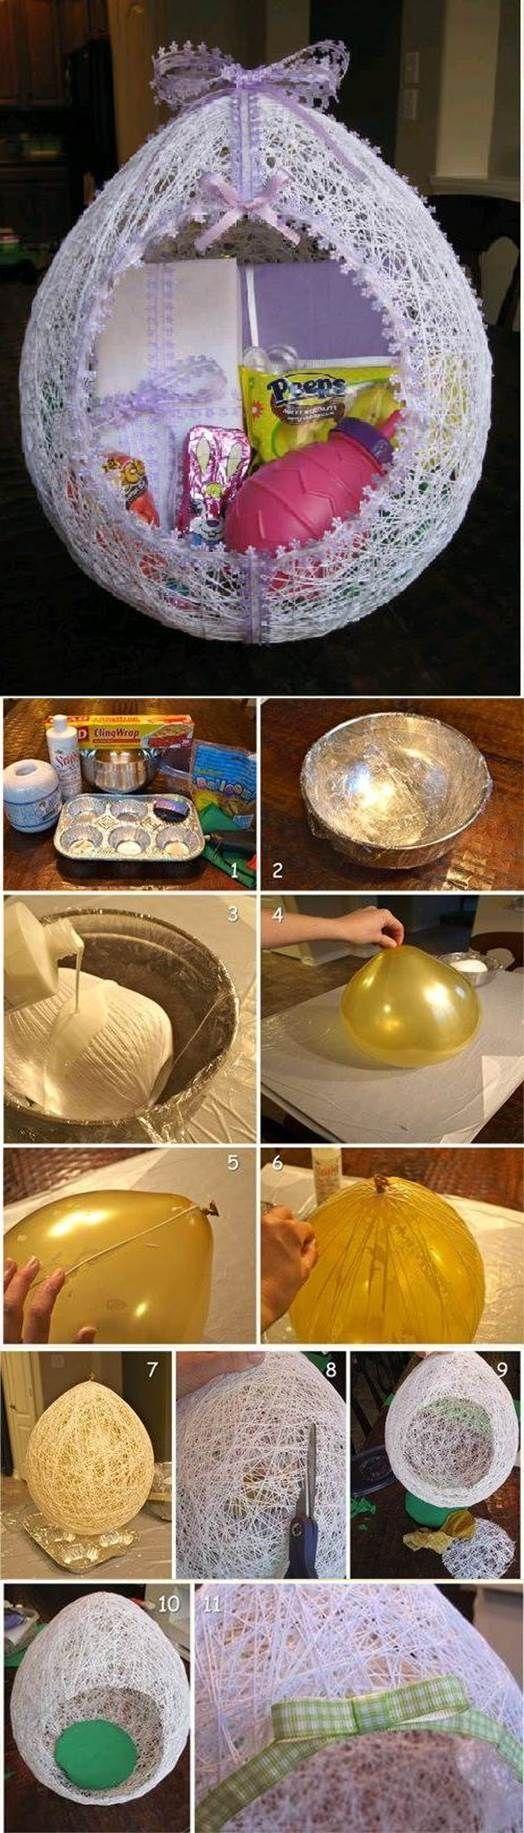 Vajíčko z nití              DIY Egg Shaped Easter String Basket | http://iCreativeIdeas.com LIKE Us on Facebook ==> https://www.facebook.com/icreativeideas